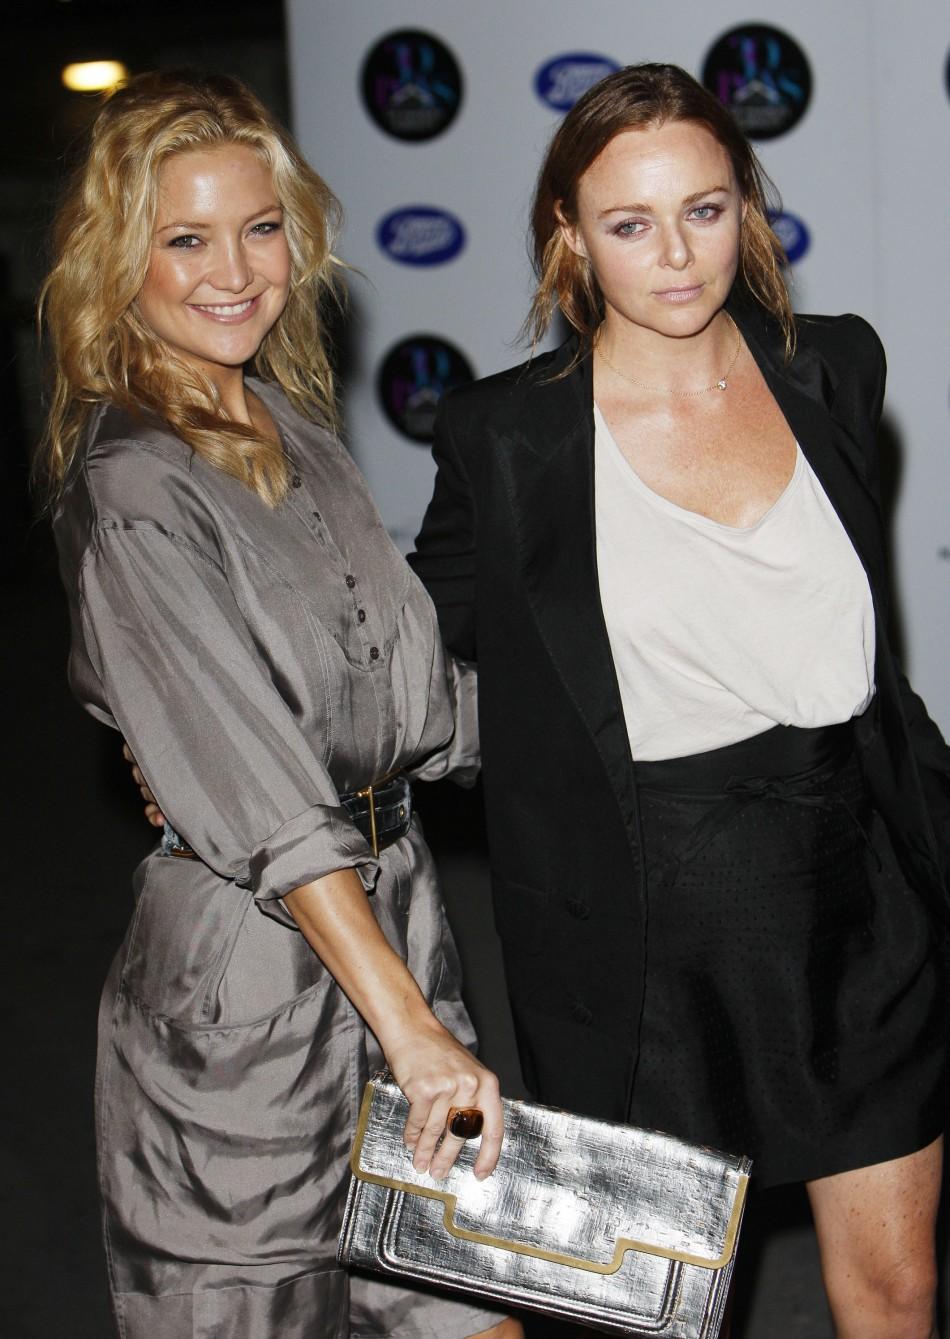 British Fashion Awards 2011 Red Carpet Award - Stella McCartney